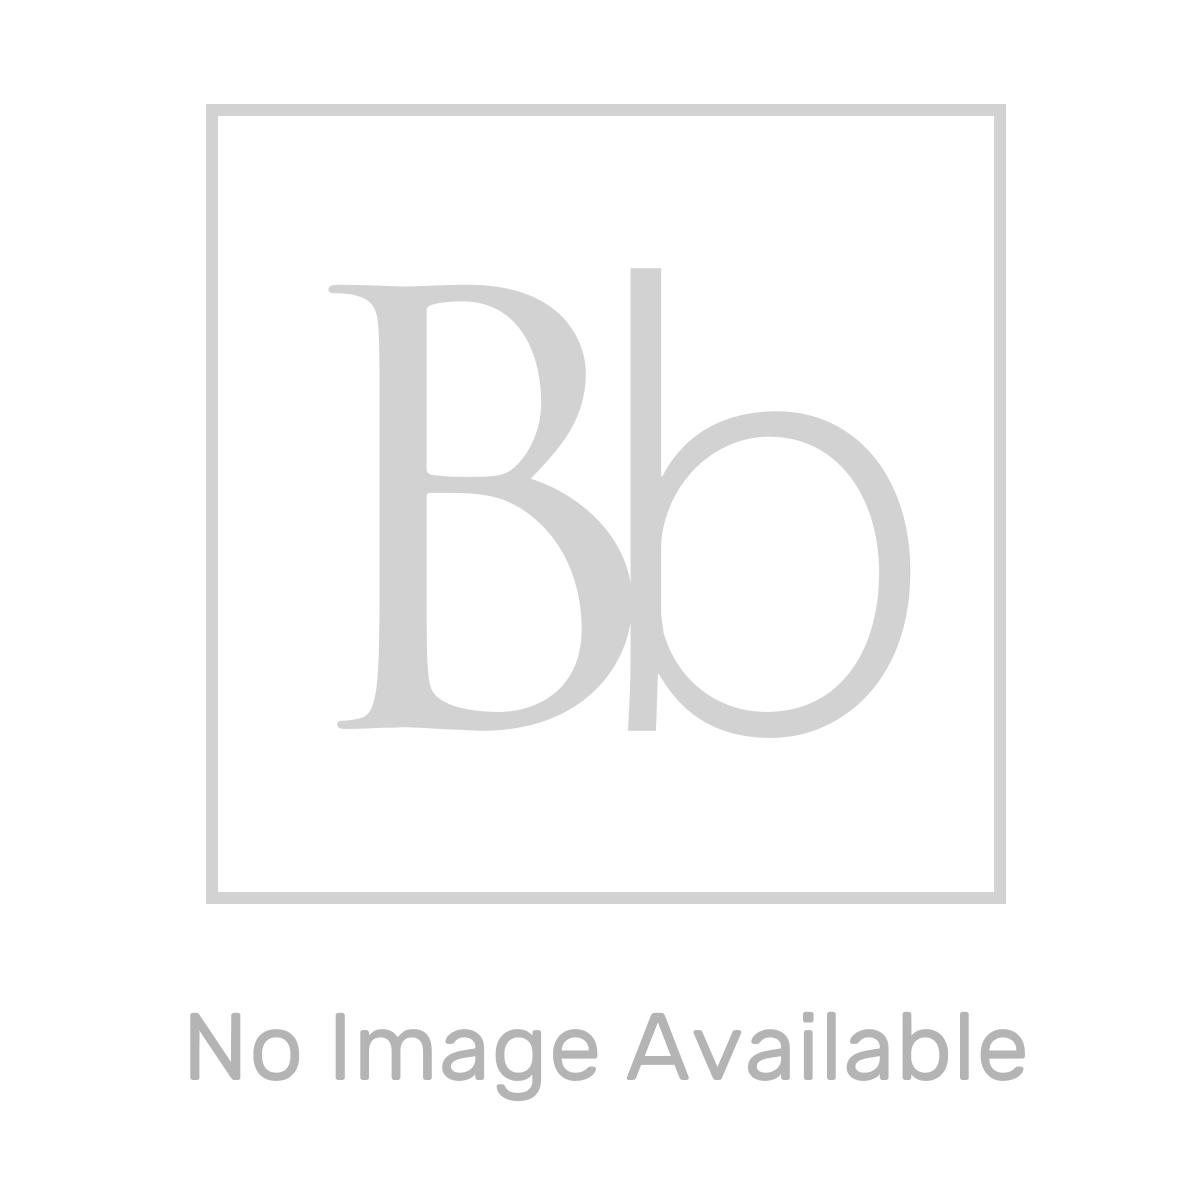 Reina Flat Anthracite Double Panel Designer Radiator 600 x 588mm